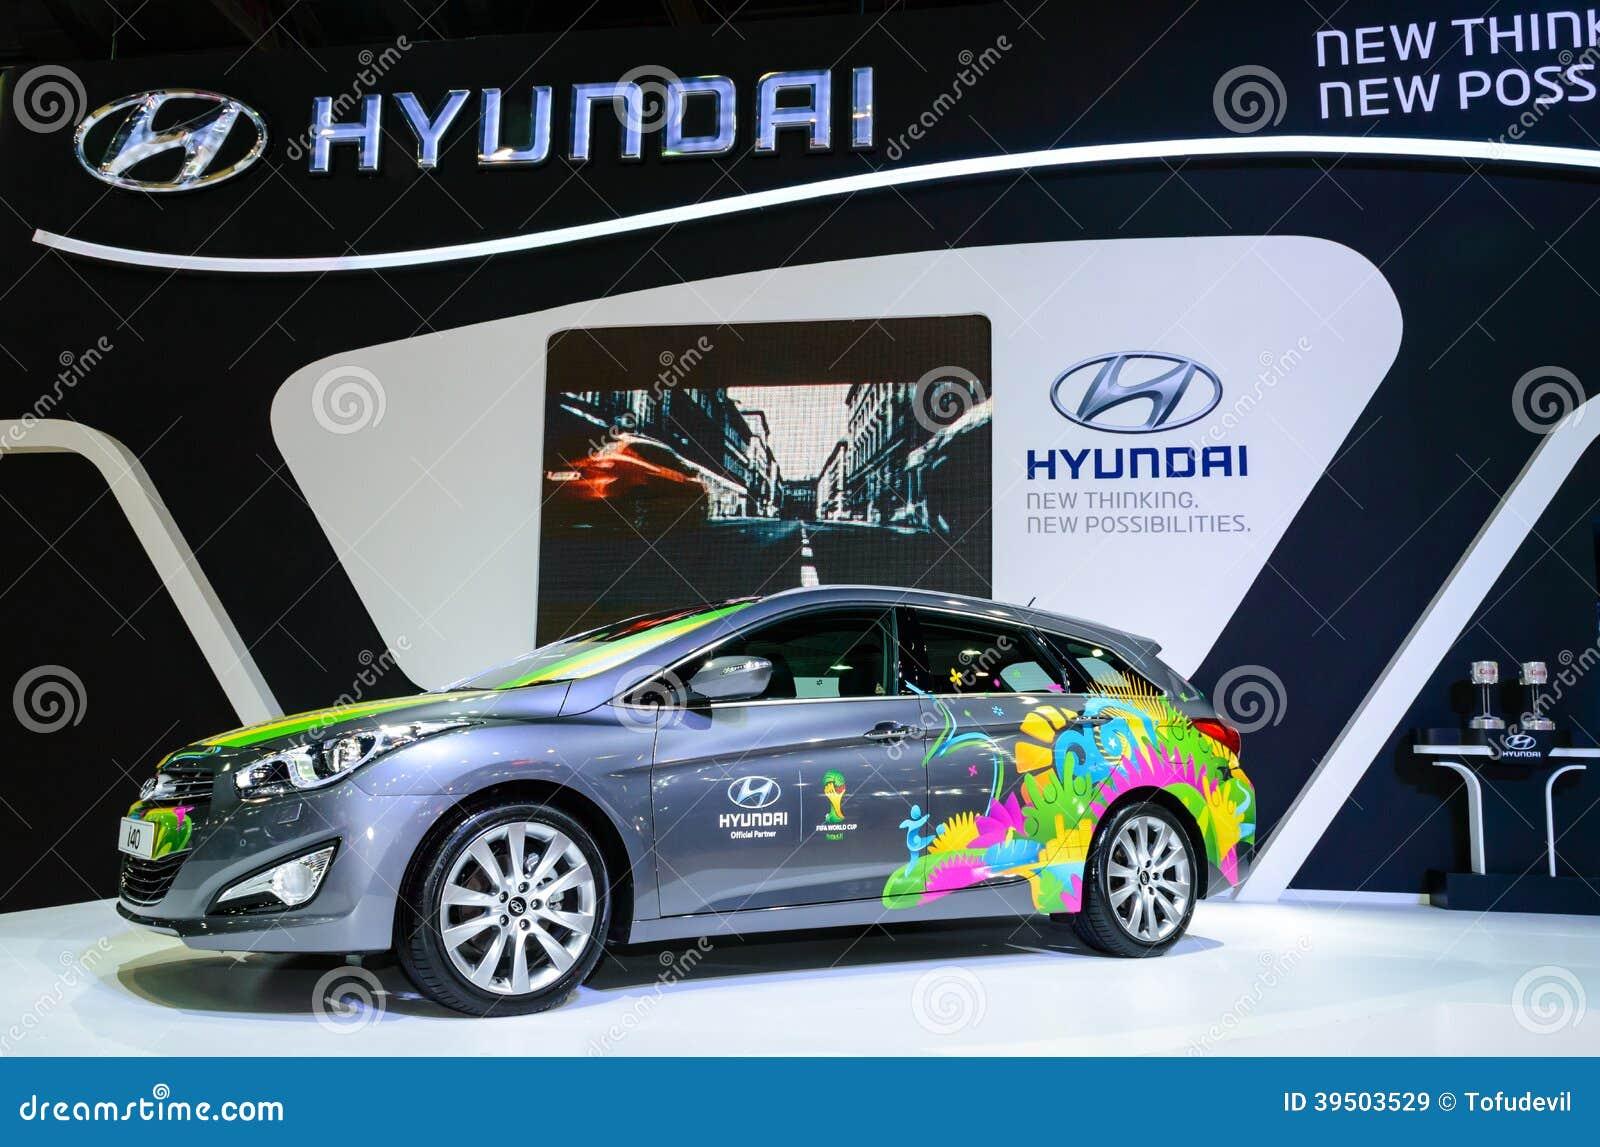 Hyundai i40 Brazil Edition Skin.